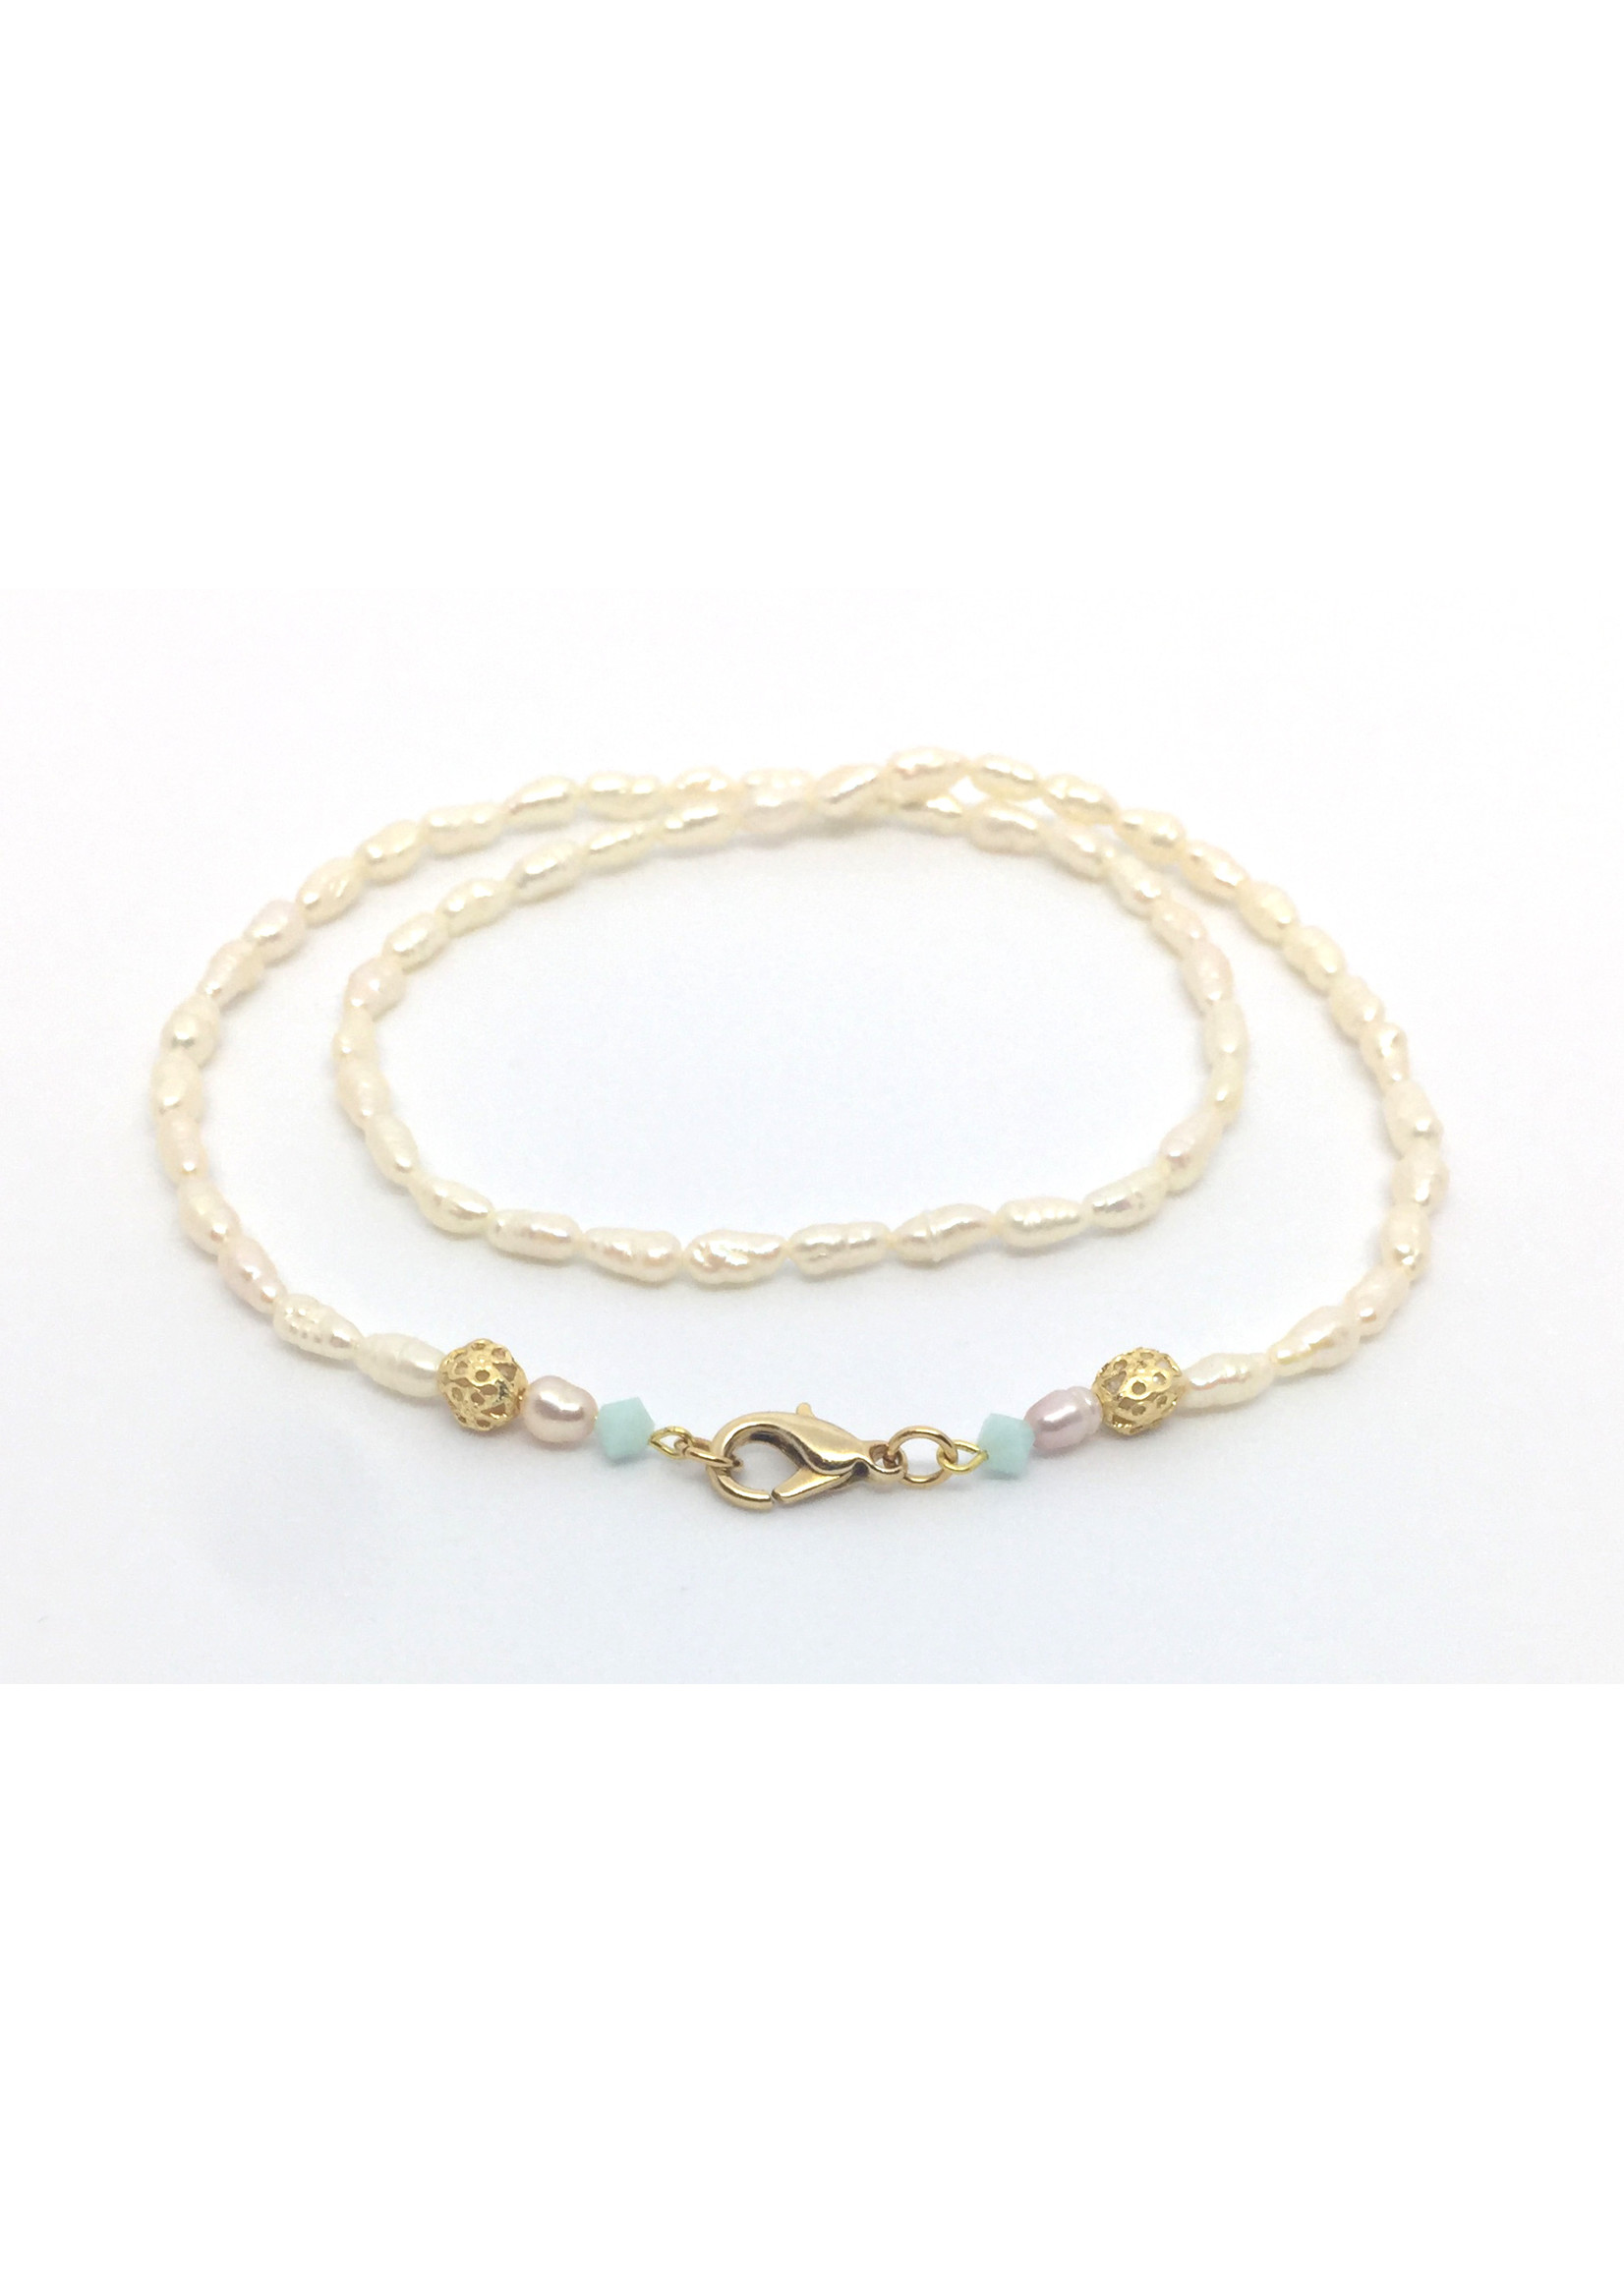 Els de Ruyter necklace 'Small pearls'